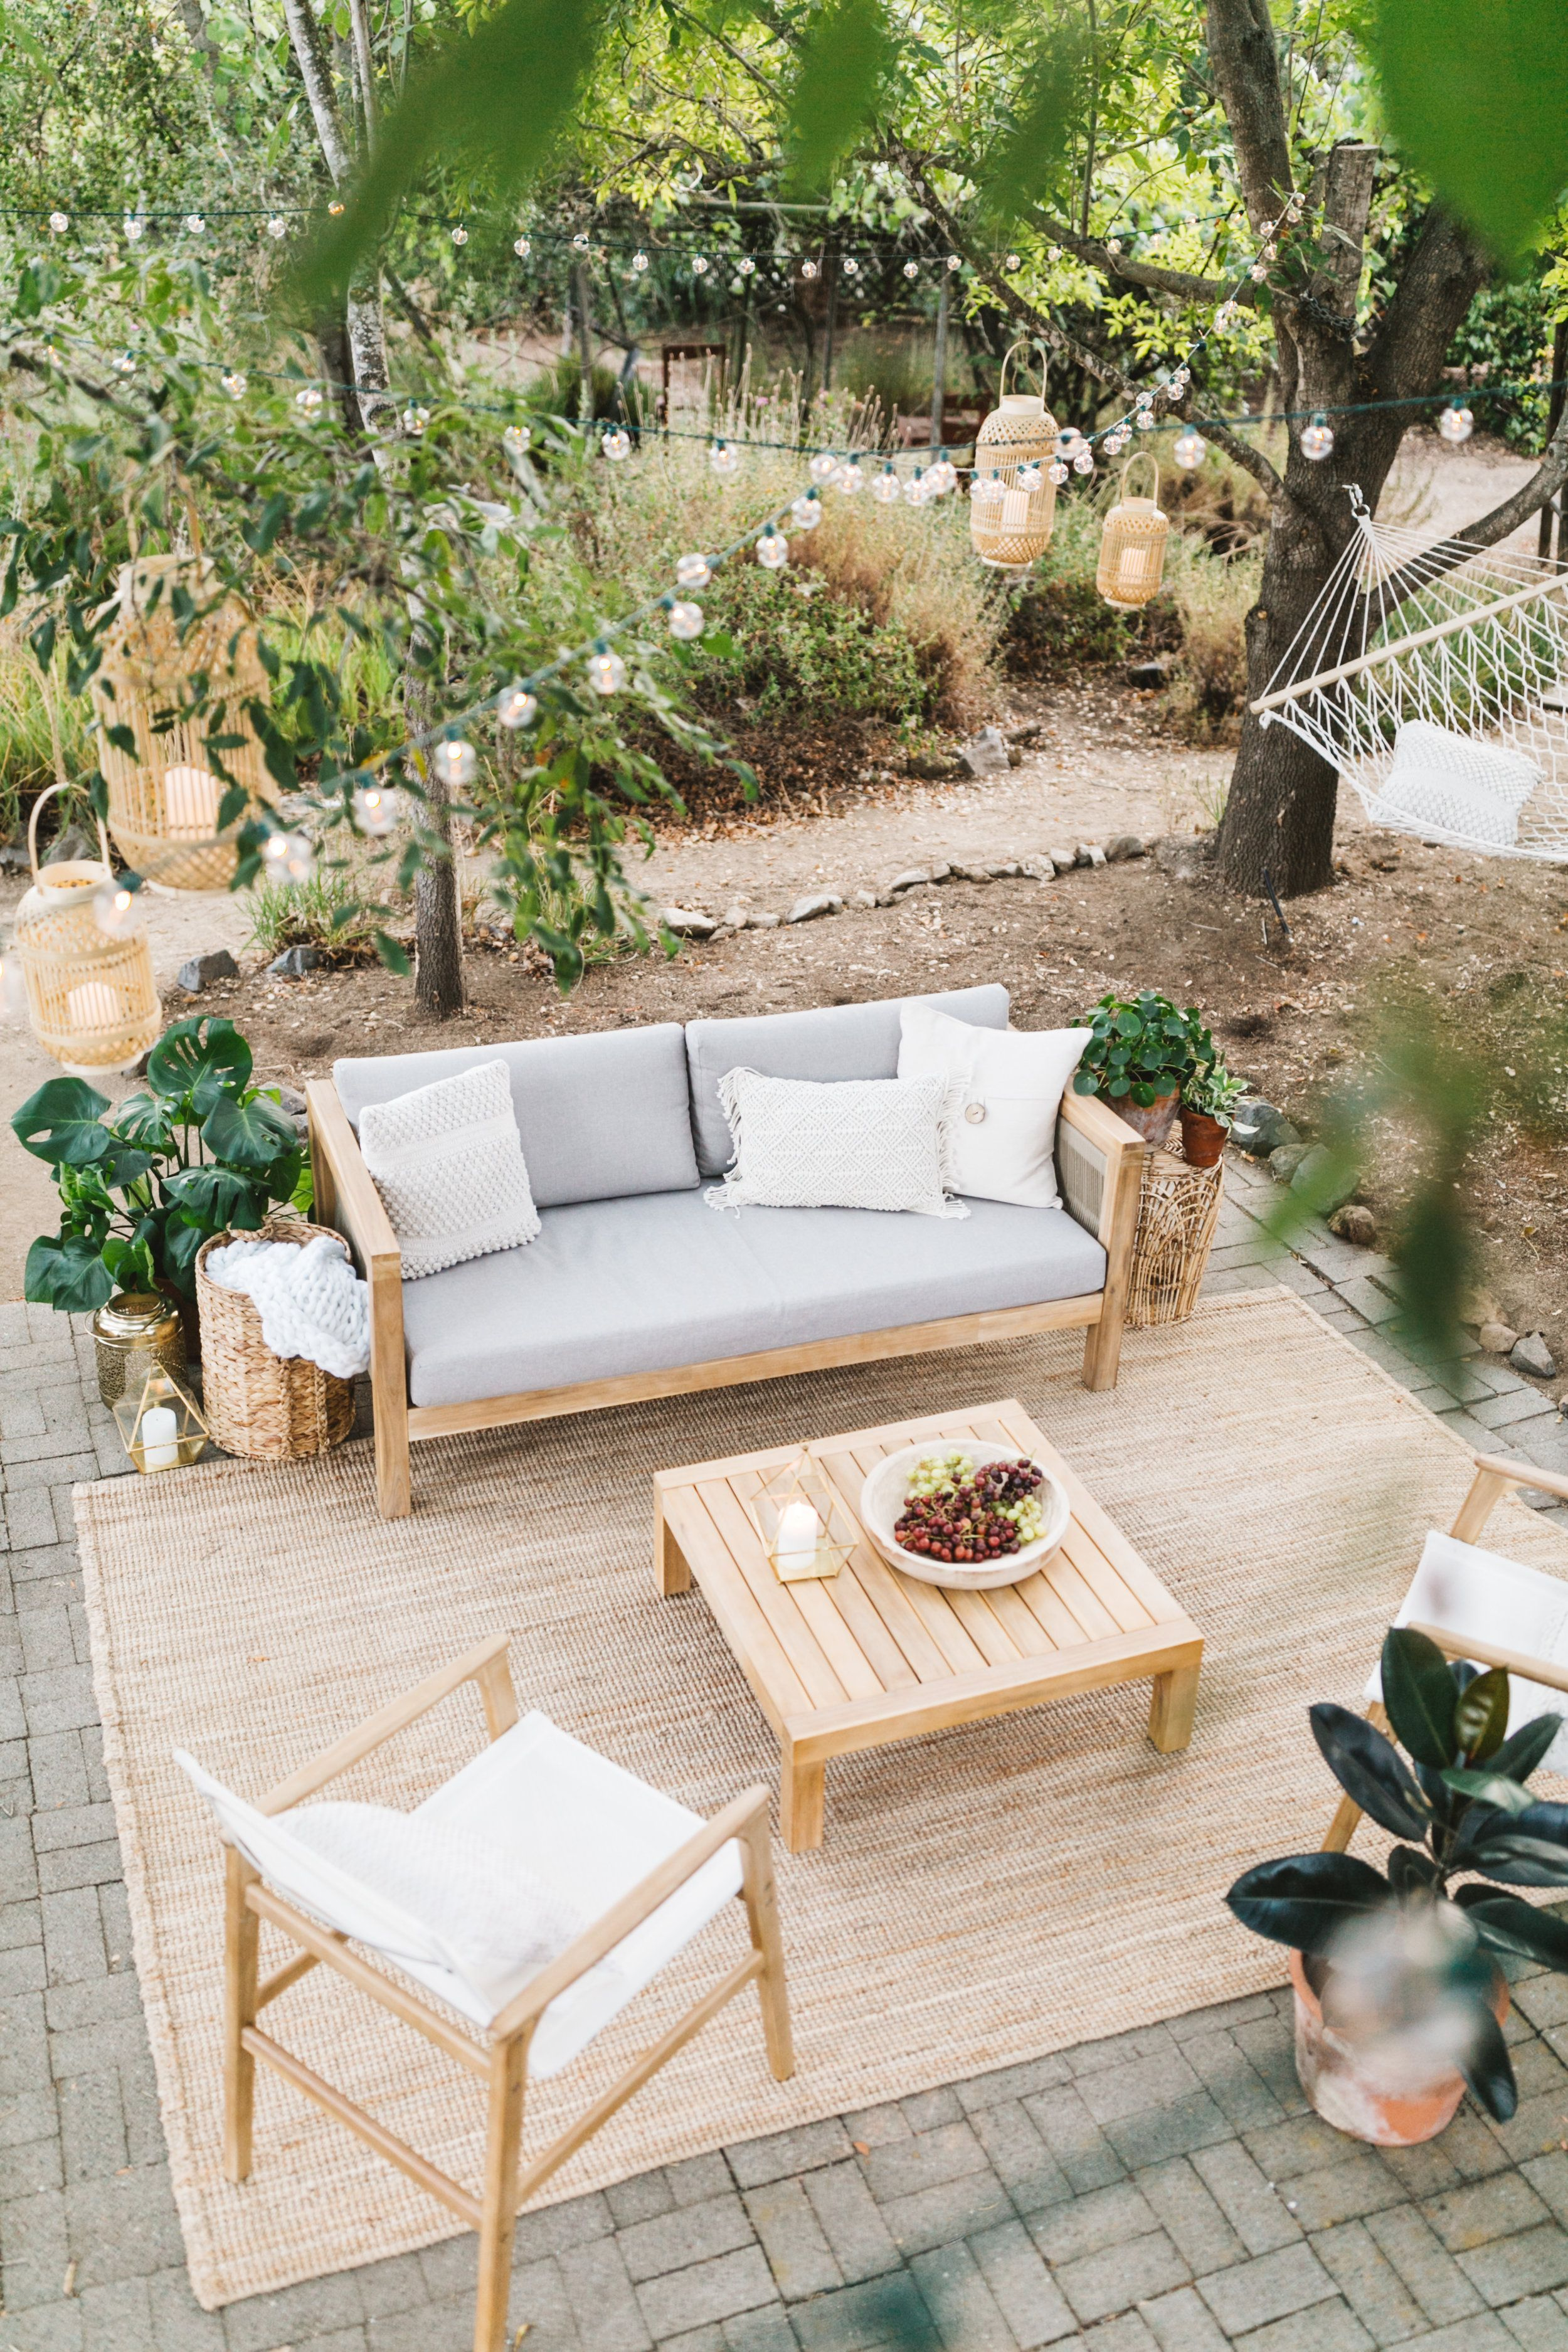 Outdoor Patio Design Inspiration Outdoor Living Area Patio Furniture Ideas Bistro Lights In 2020 Outdoor Patio Designs Garden Furniture Design Patio Design